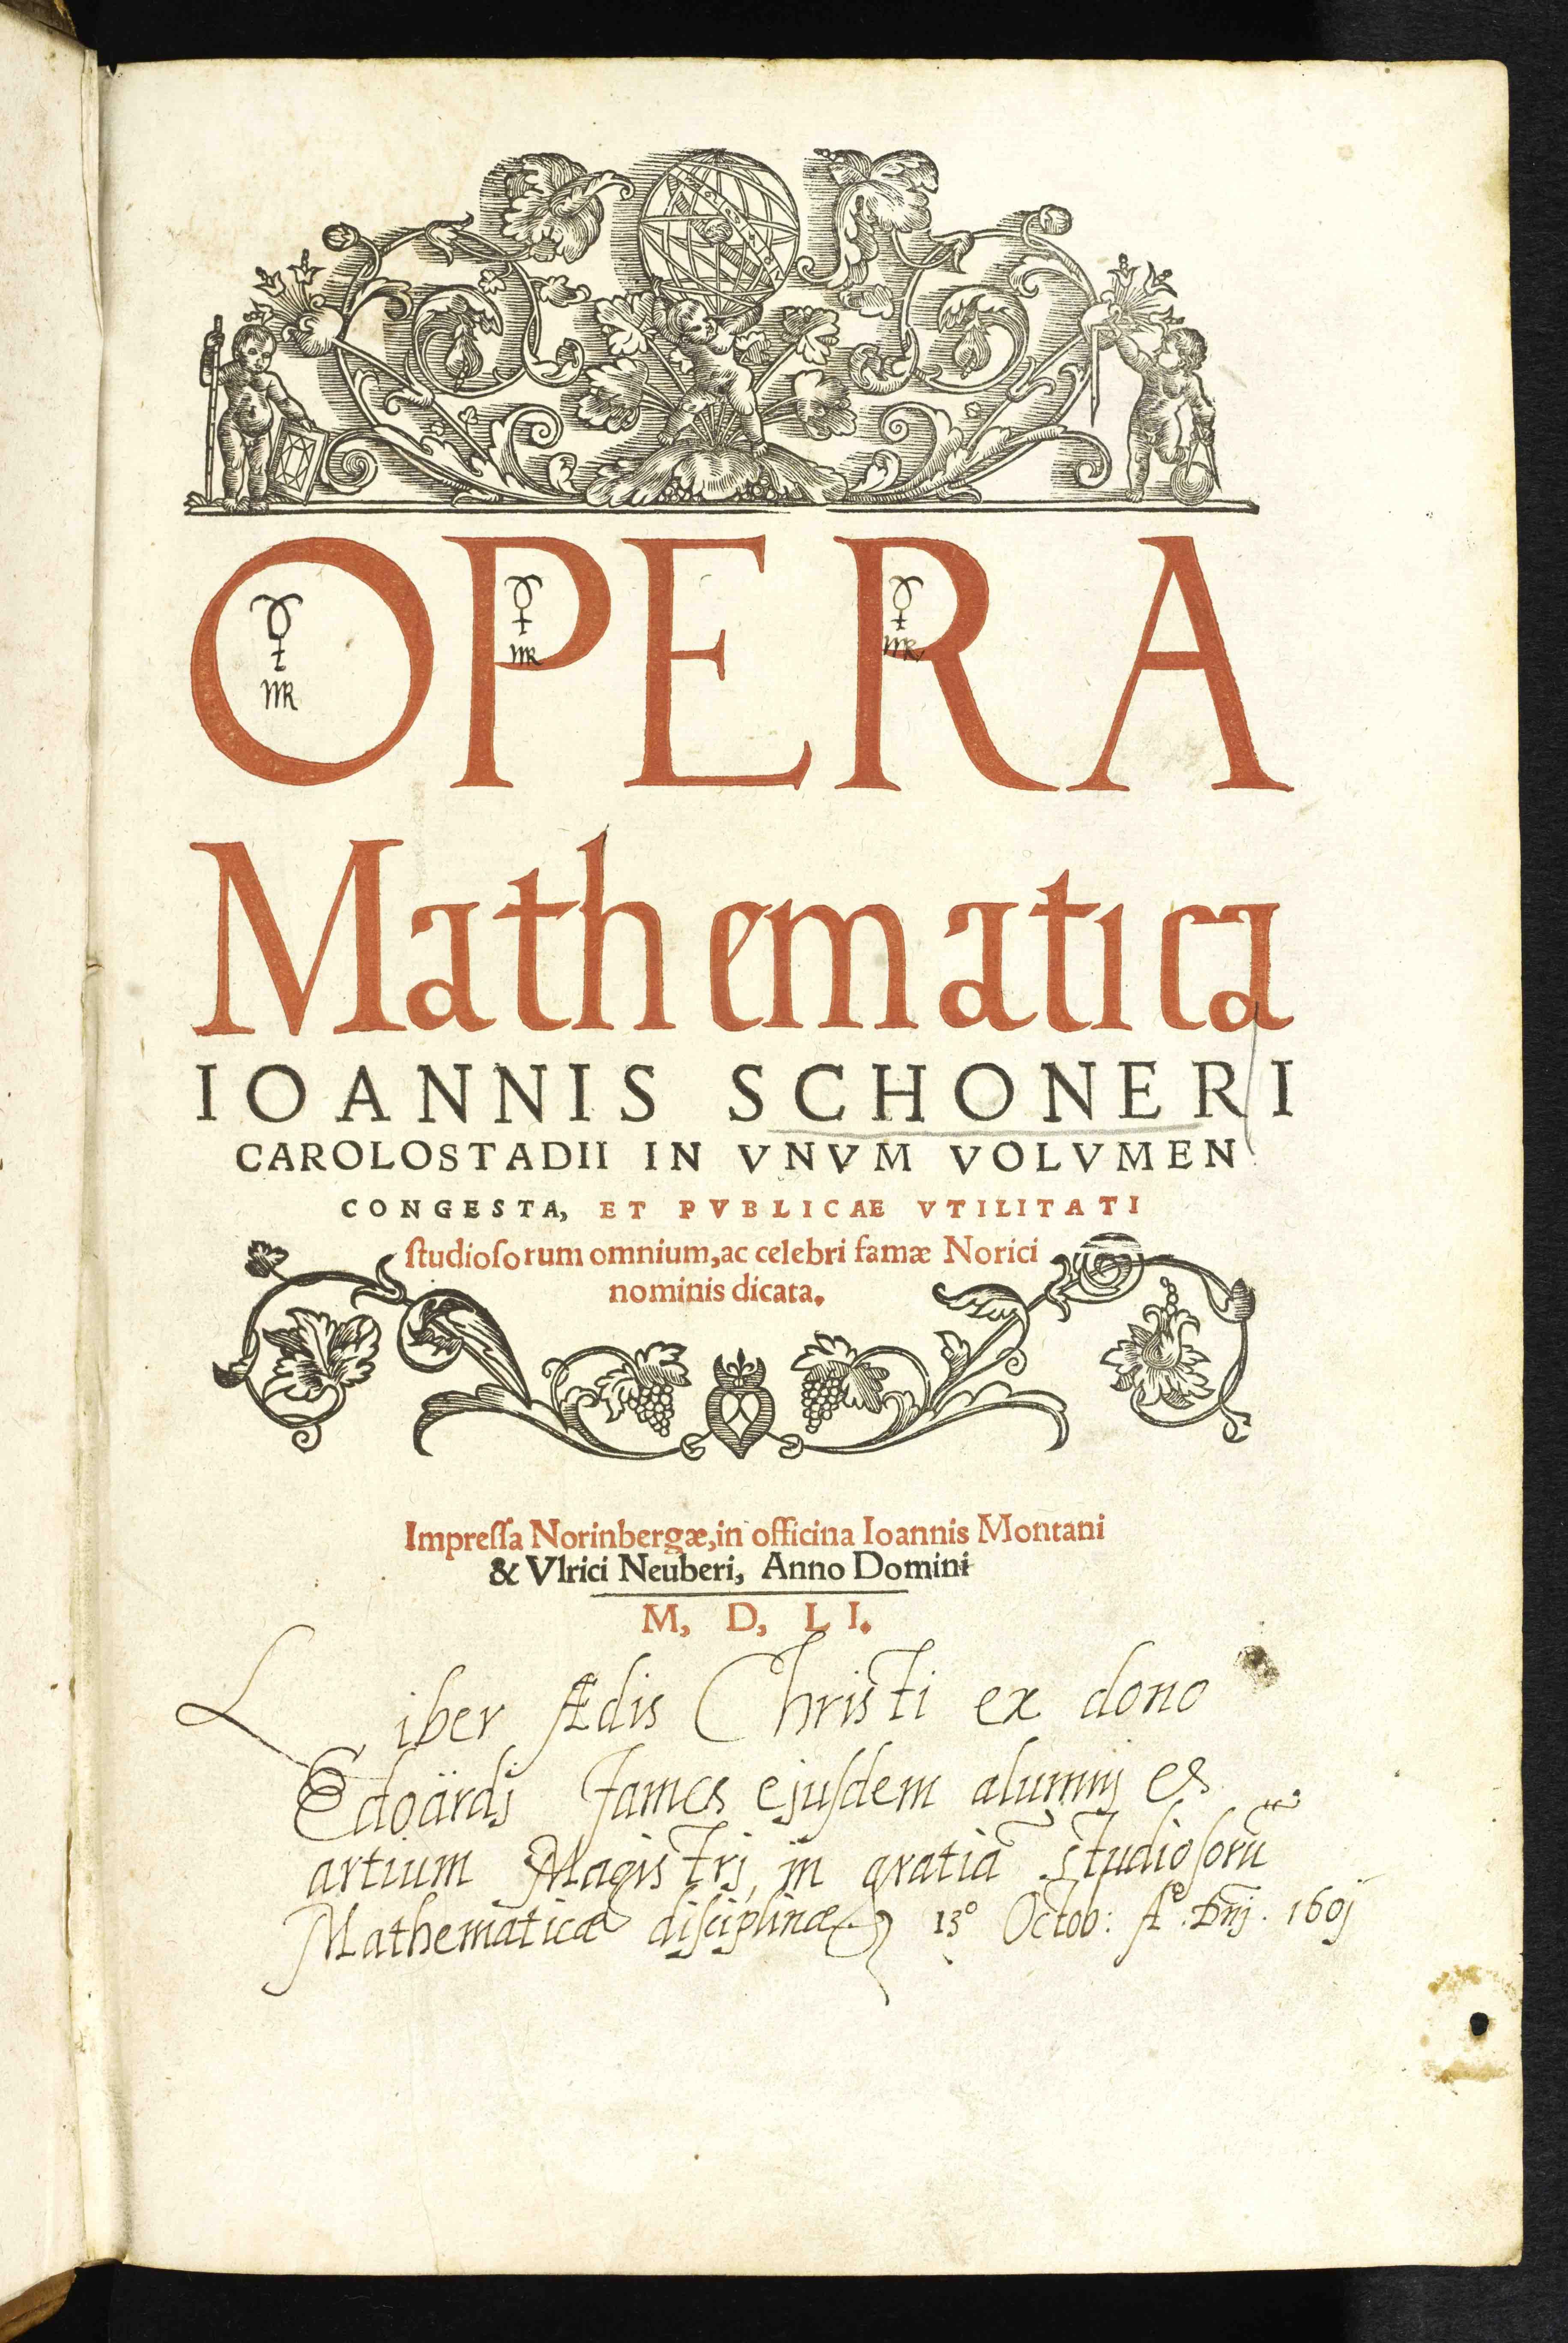 """Johannes Schöner, Opera mathematica (Nurnberg: in officina Ioannis Montani & Ulrici Neuber, 1551). Titlepage."""